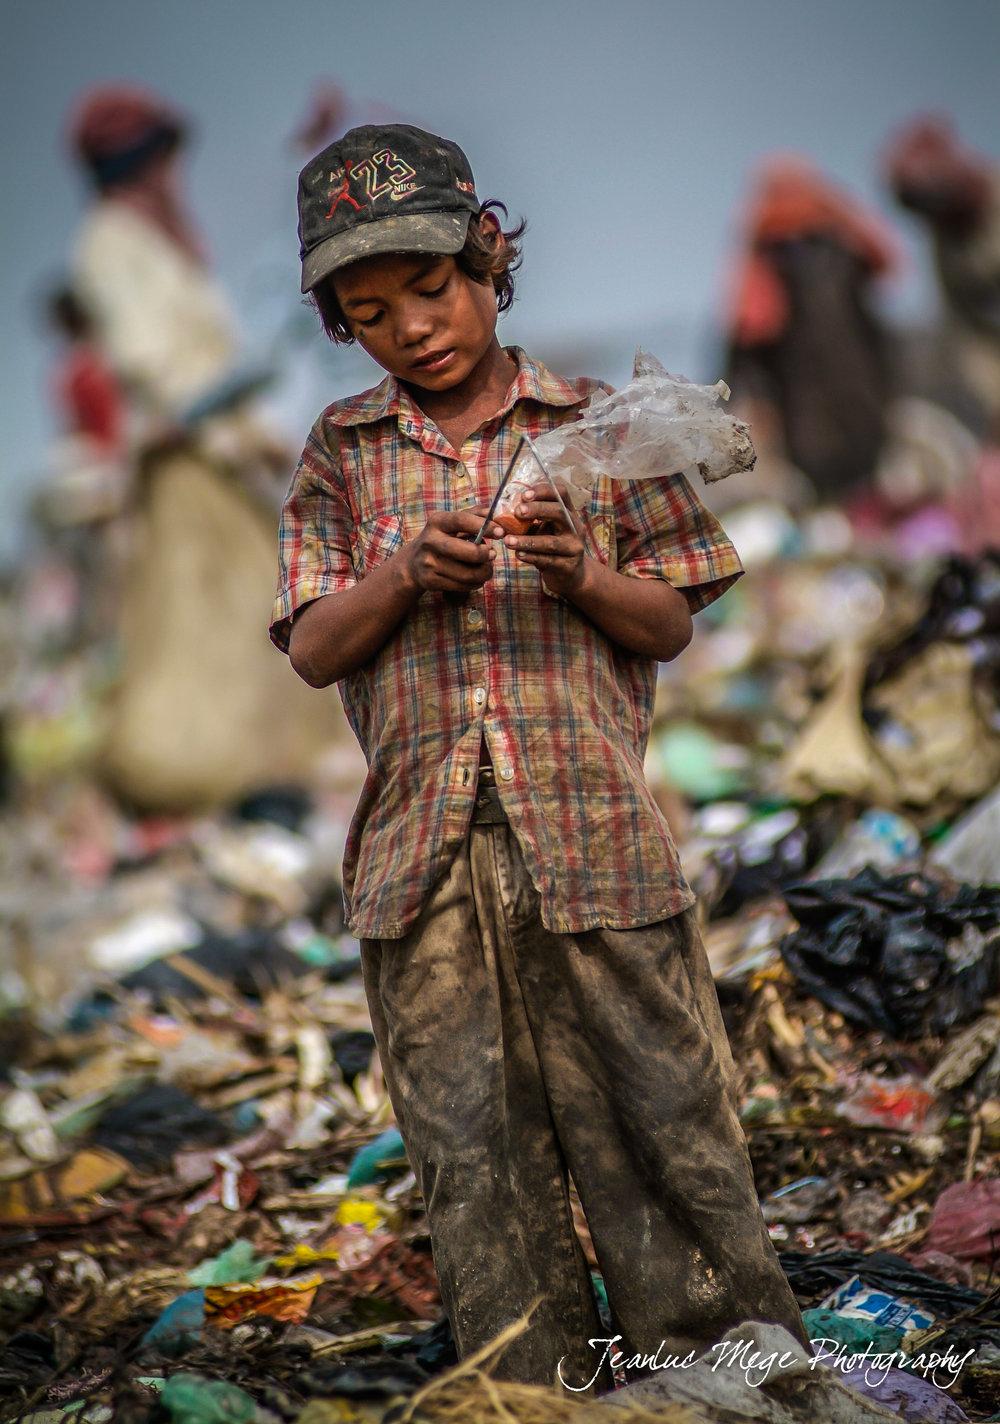 Jean Luc Mege Cambodia-8813.jpg